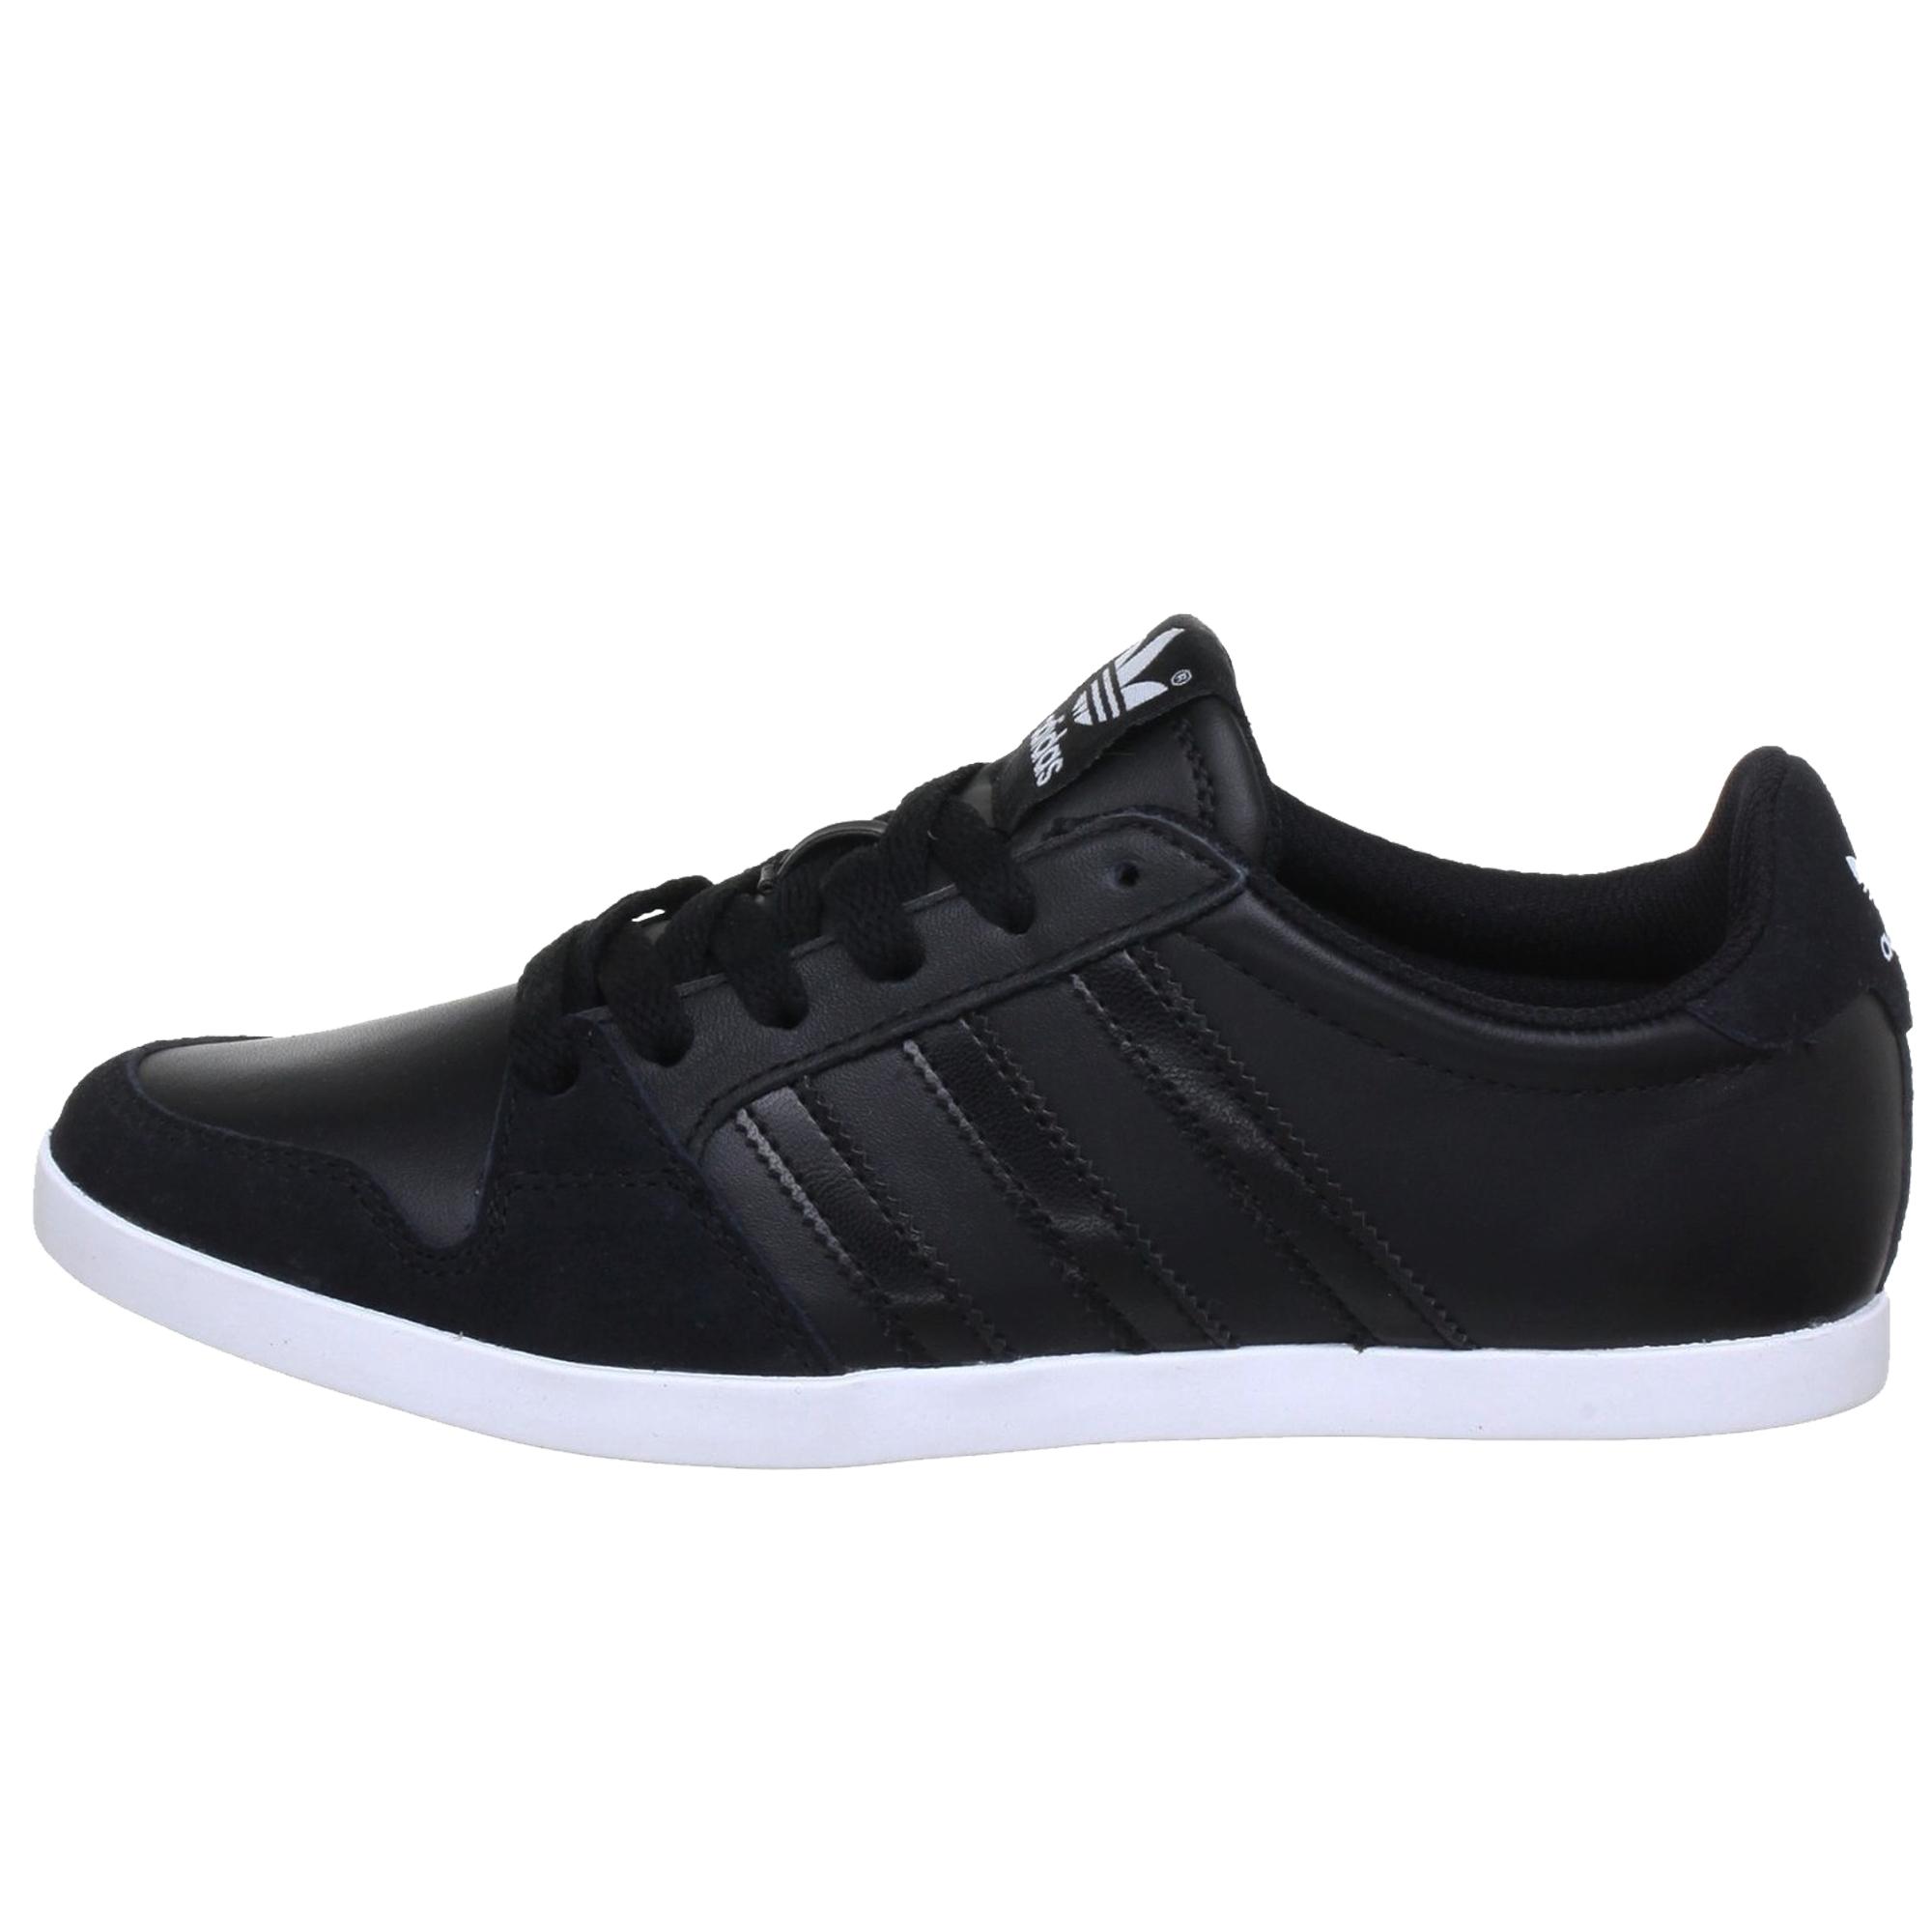 nouveau produit e681f 7fbb5 adidas Adilago Low CO Erkek Spor Ayakkabı